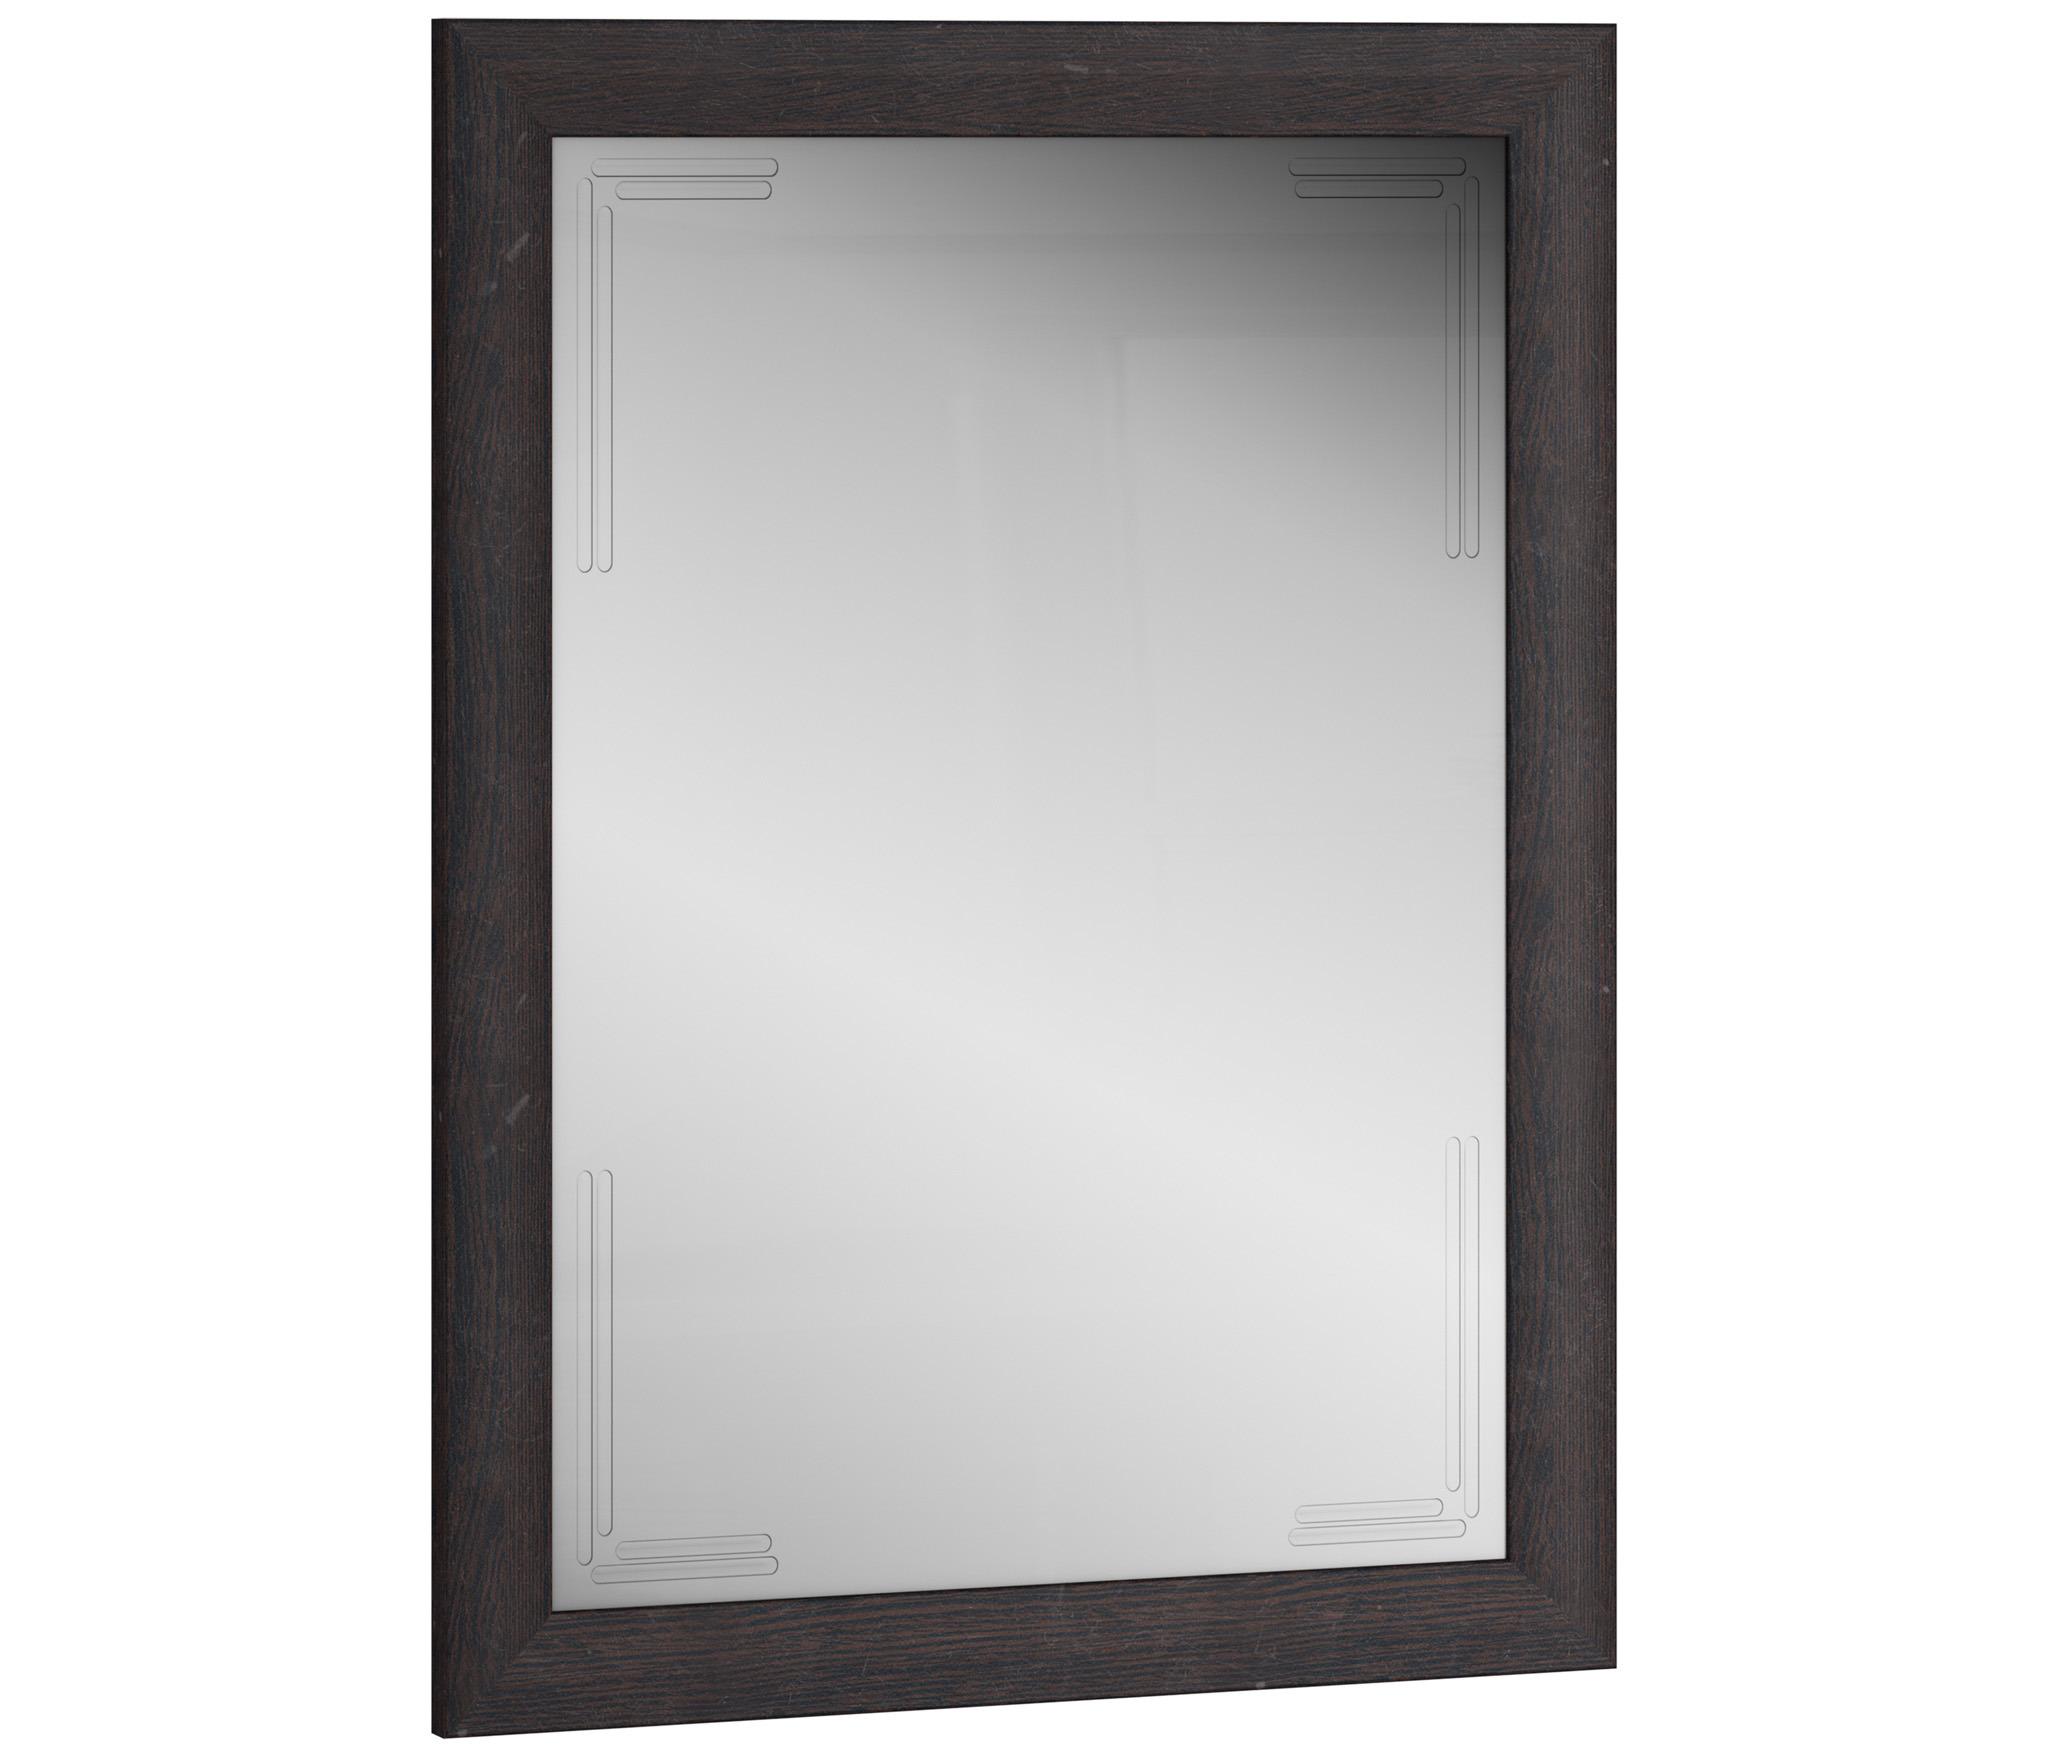 Джорджия  СБ-2286 ЗеркалоЗеркала<br><br><br>Длина мм: 796<br>Высота мм: 596<br>Глубина мм: 22